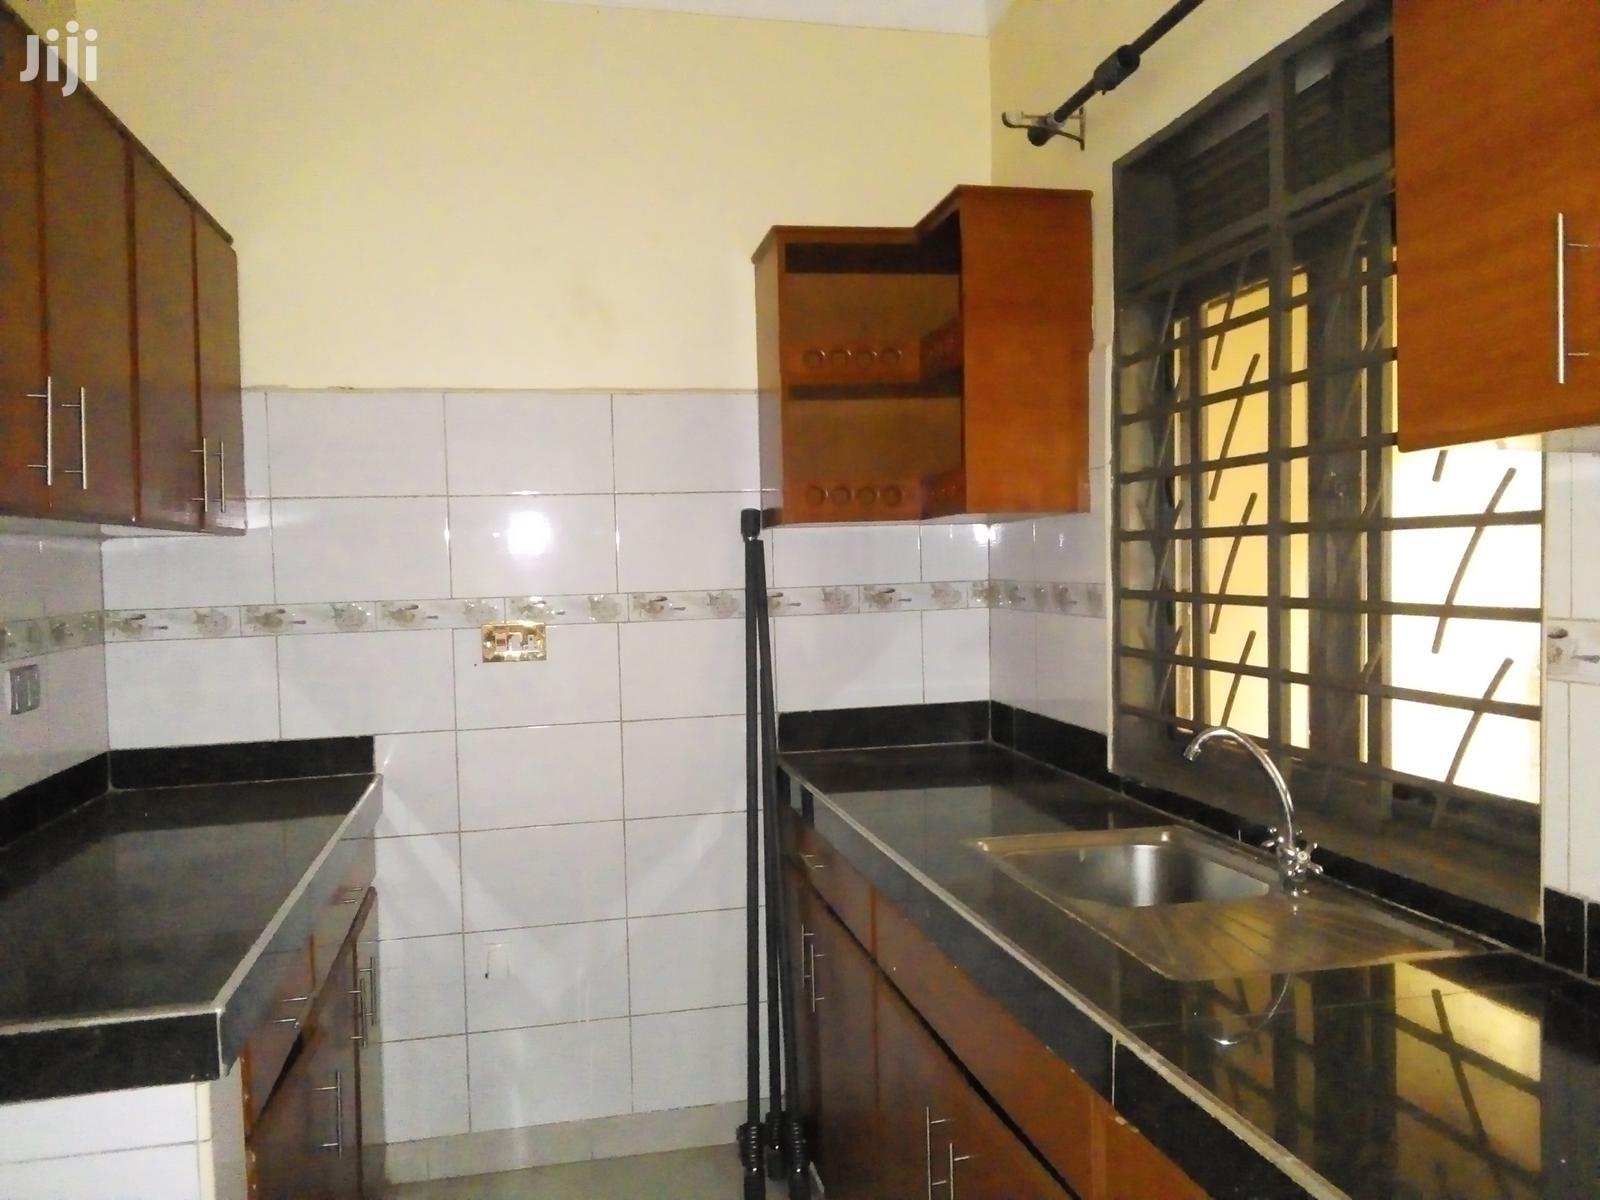 Kyaliwajjala 2 Bedroom House For Rent | Houses & Apartments For Rent for sale in Kampala, Central Region, Uganda